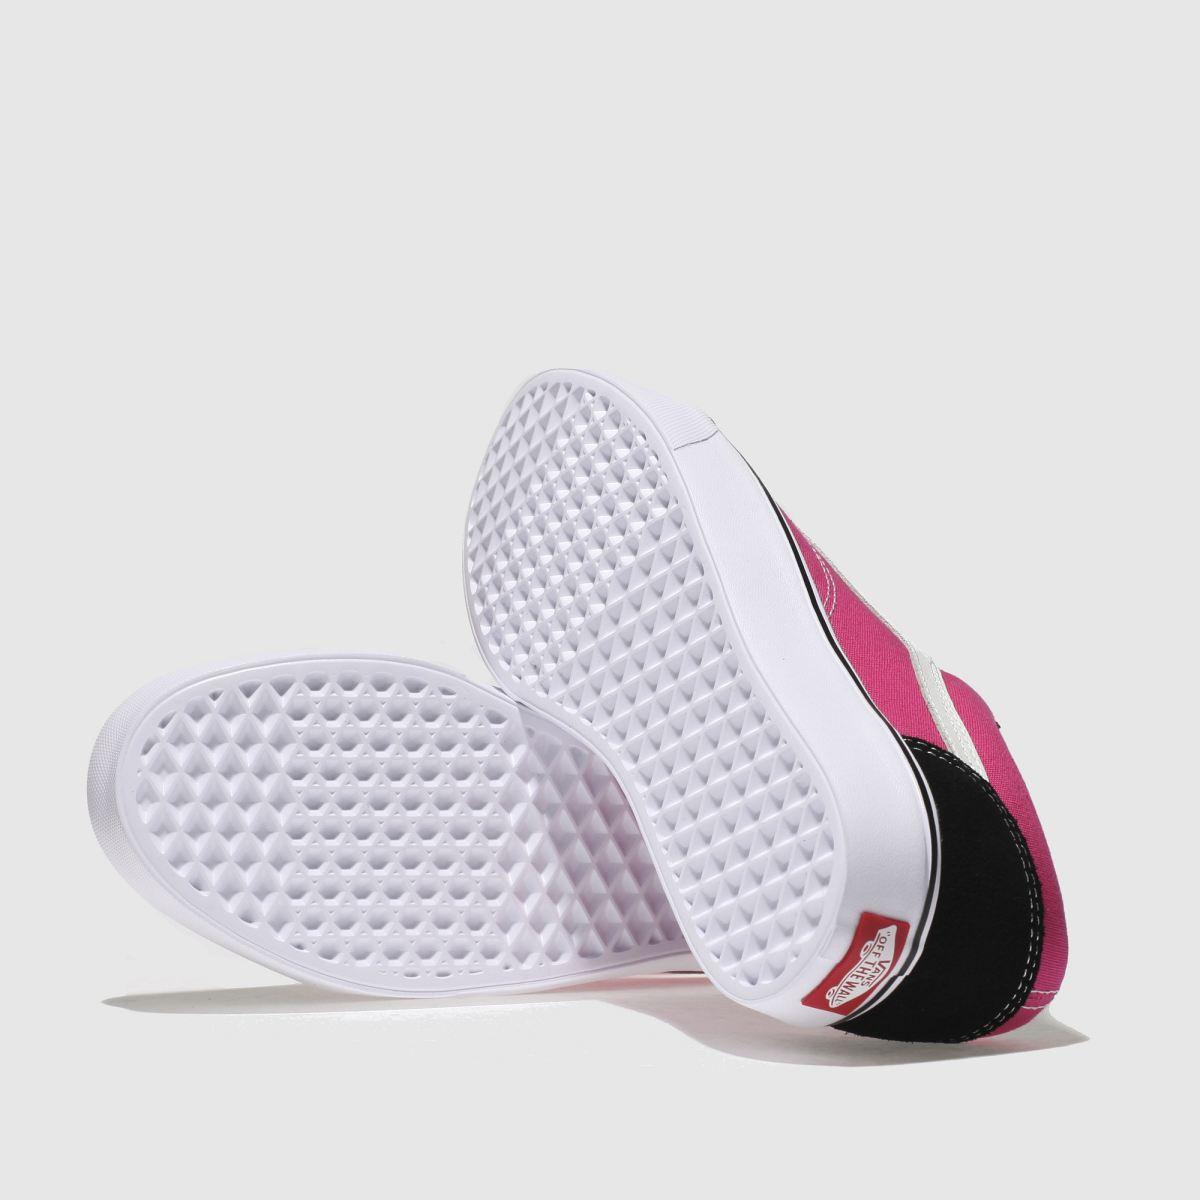 Damen Schwarz-pink vans Old Skool Lite Sneaker | Schuhe schuh Gute Qualität beliebte Schuhe | ea738f